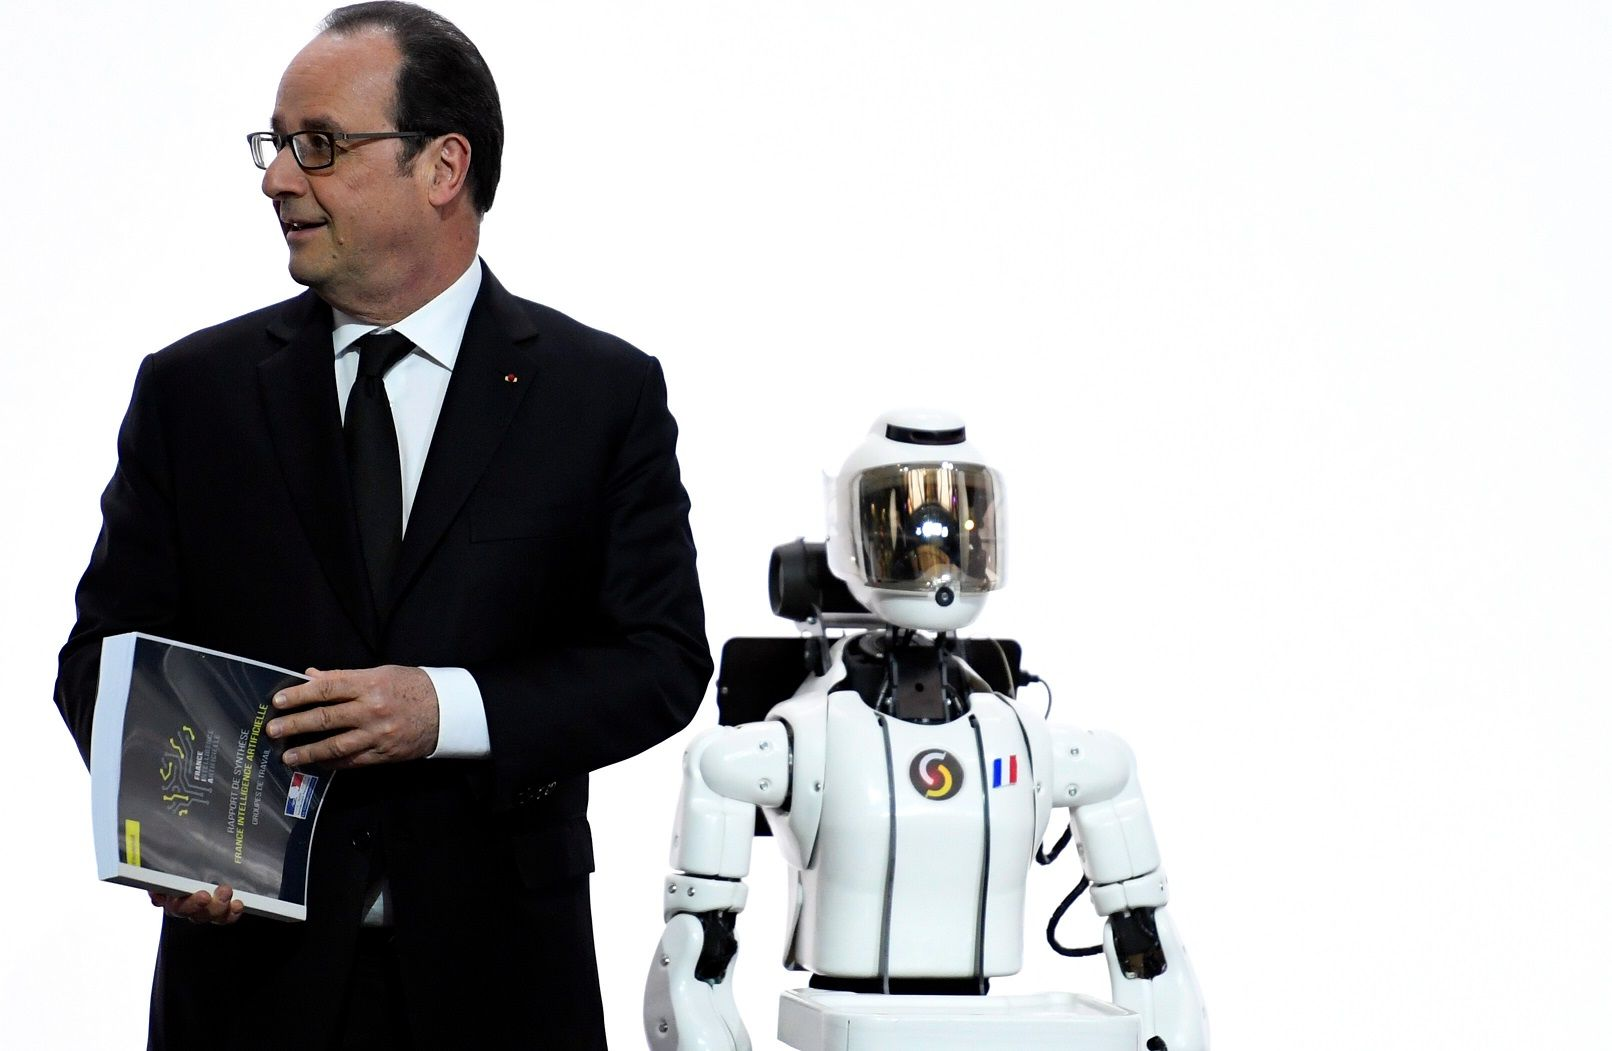 robot politician artificial intelligence AI